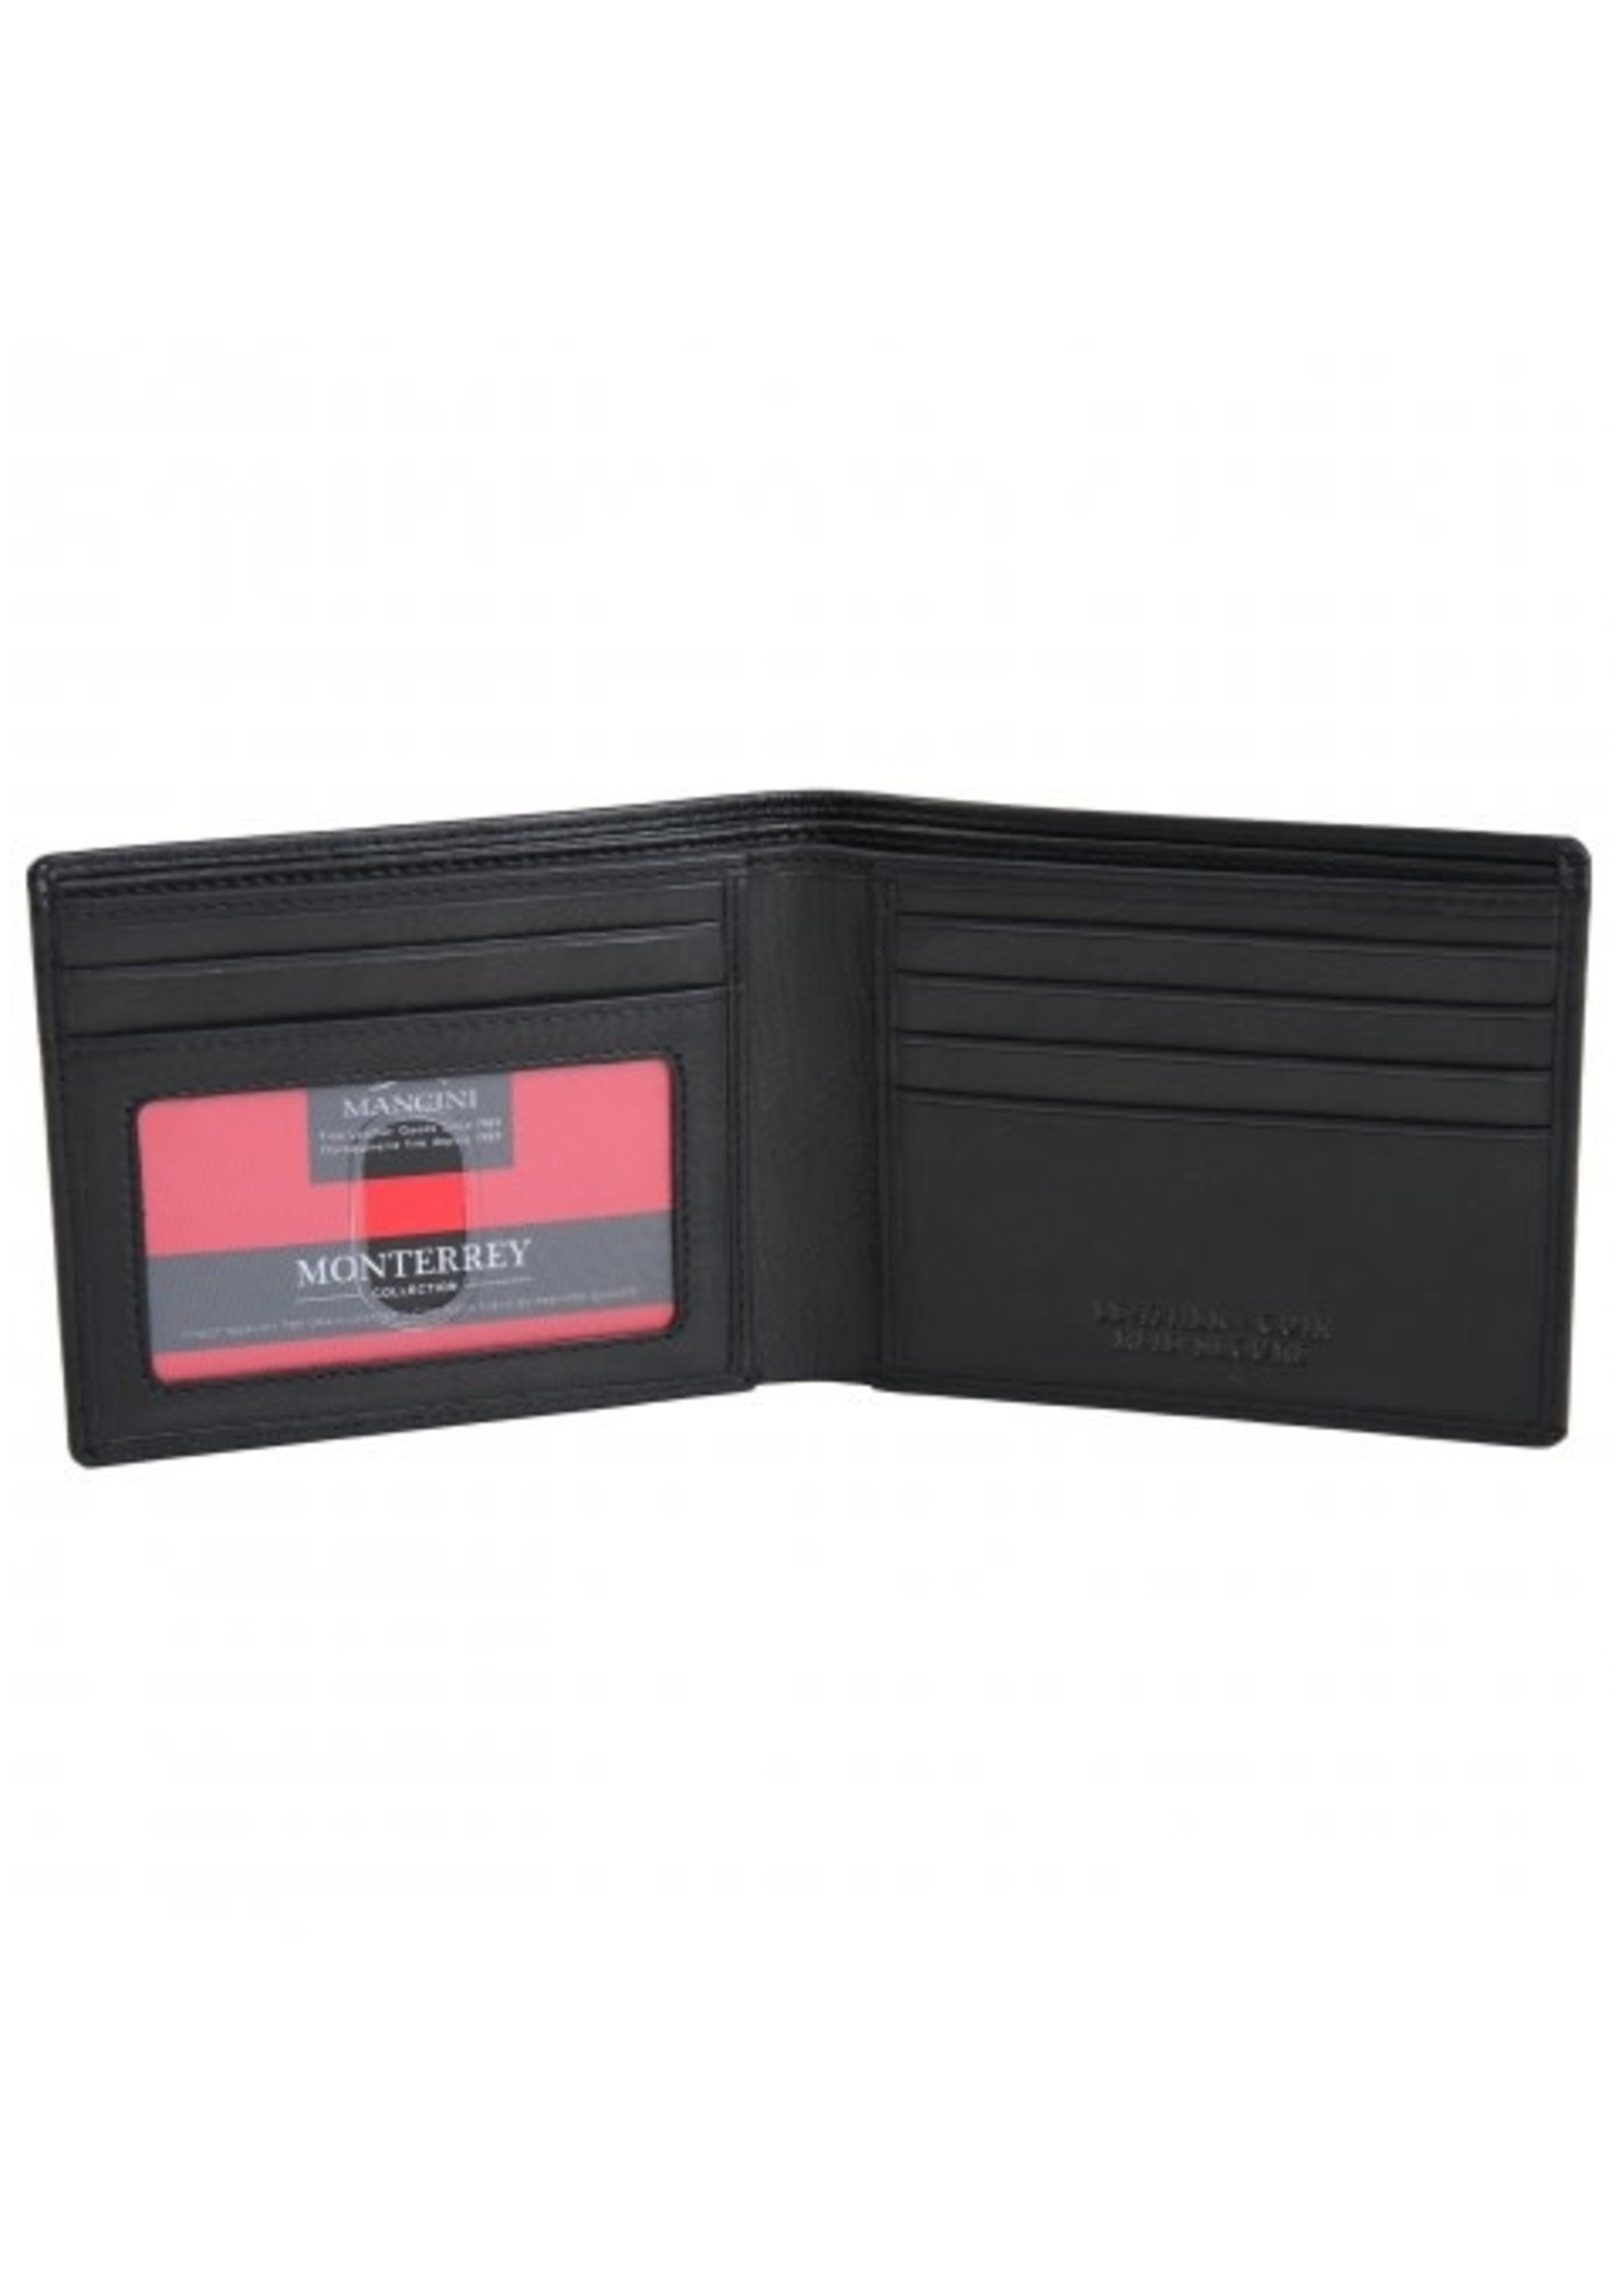 Mancini Men's Leather RFID Secure Billfold